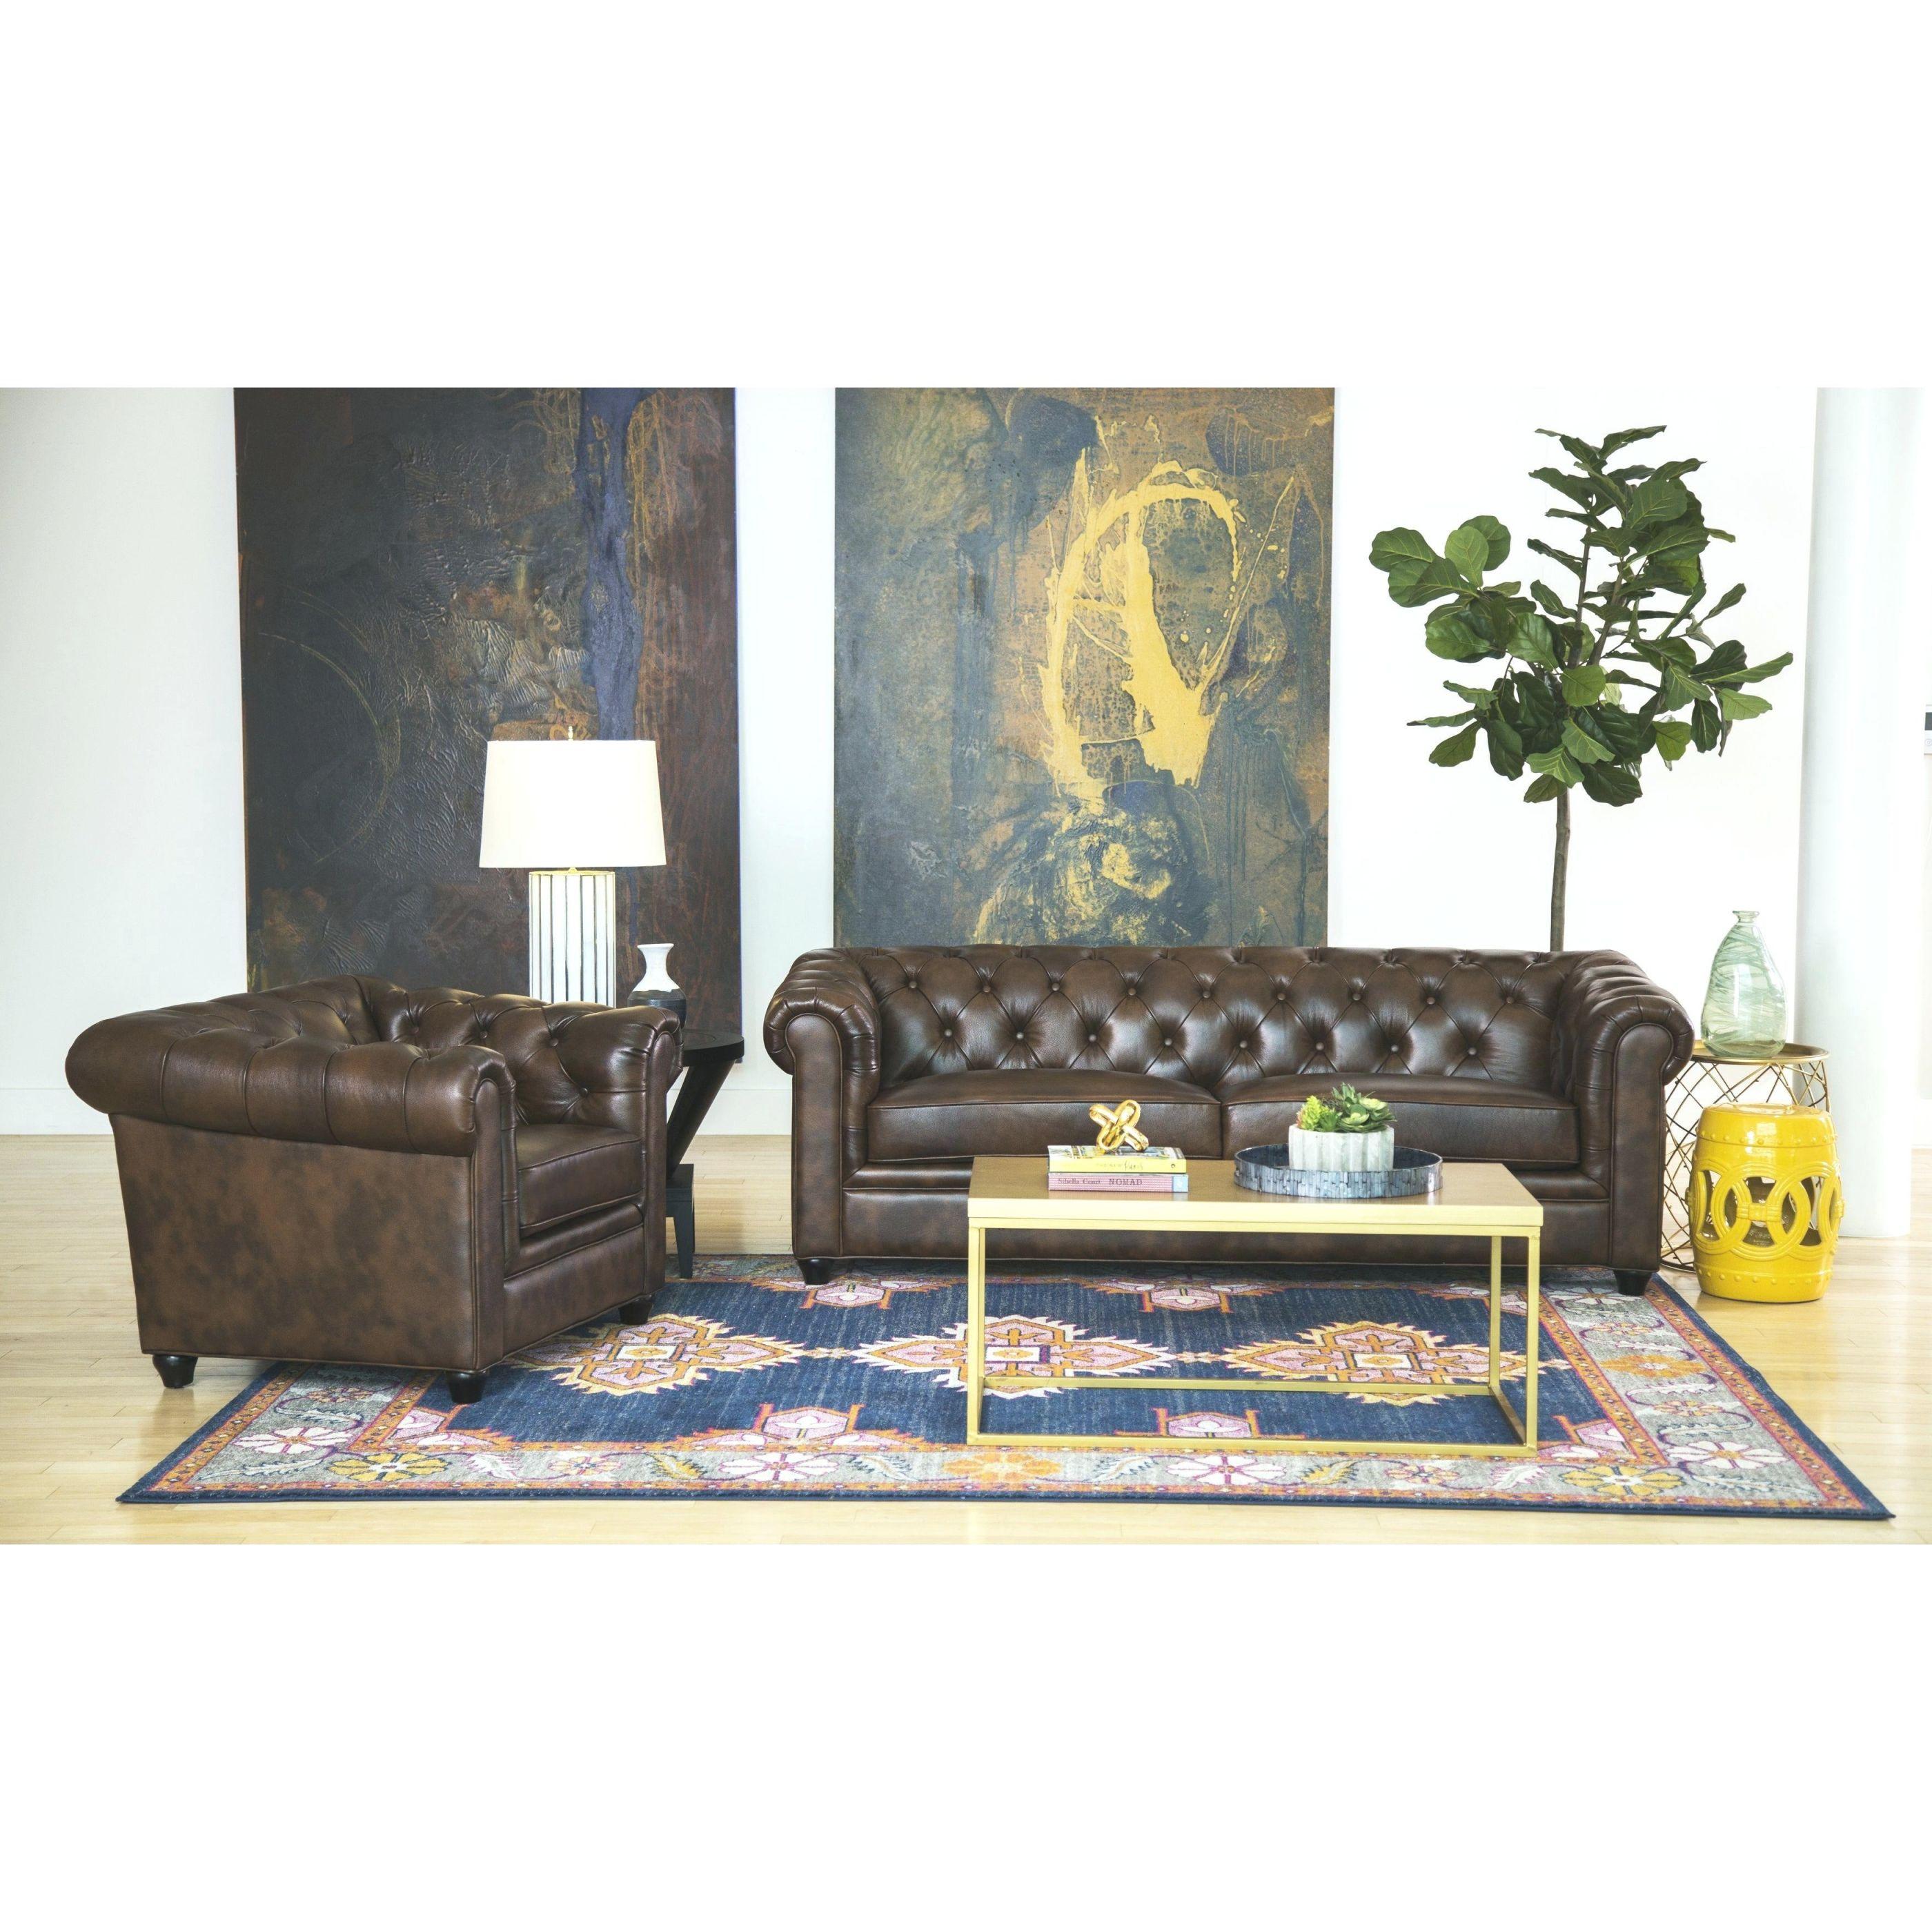 Leather Living Room Sets On – Ozdenudo.co regarding Living Room Furniture Sets For Sale